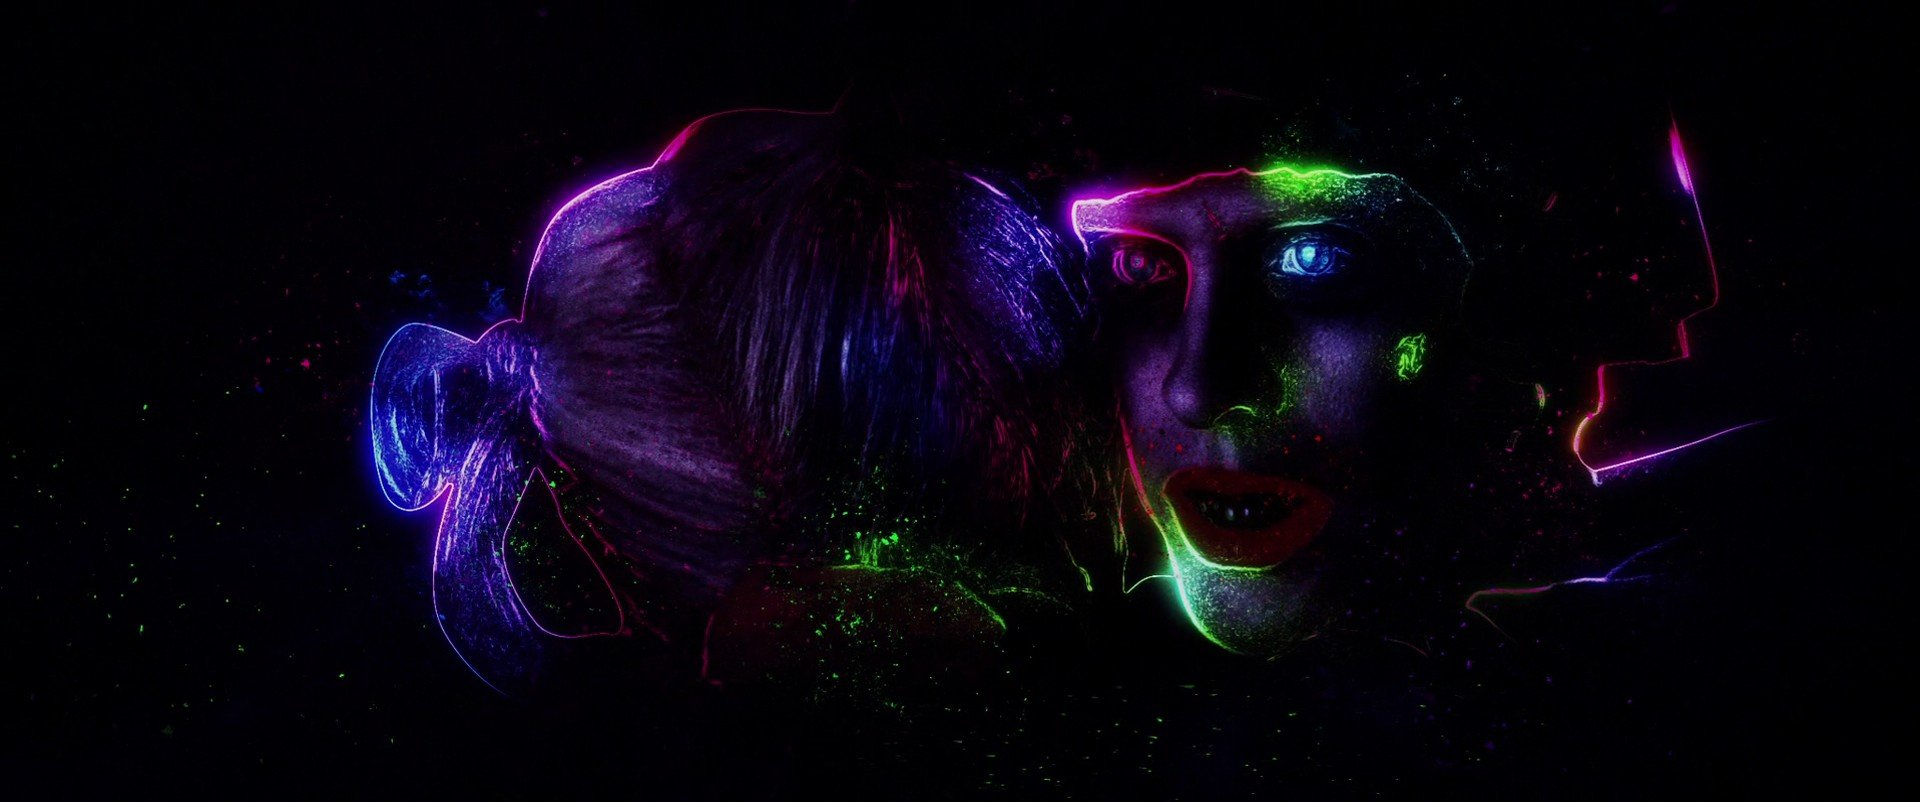 Joker, Face, Suicide Squad, Artwork, Digital art Wallpaper